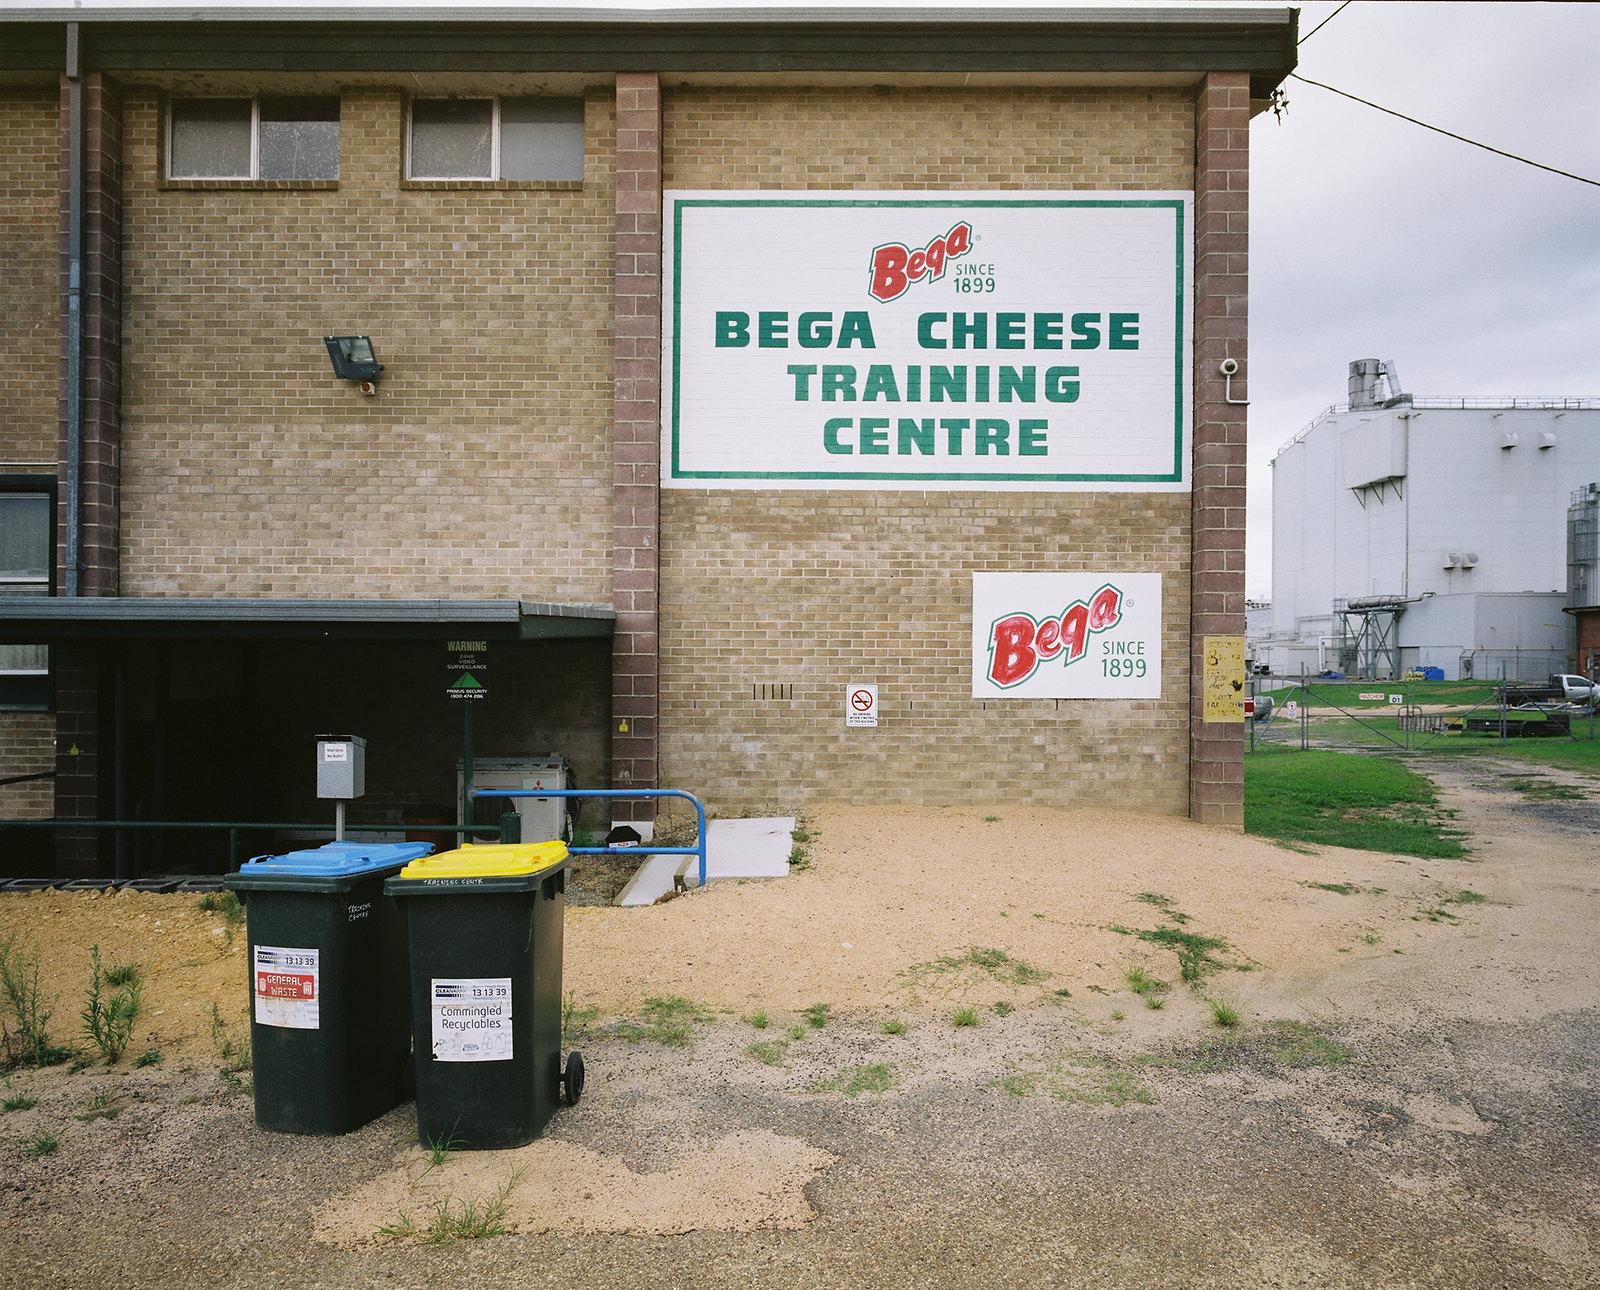 Bega Cheese Training Centre